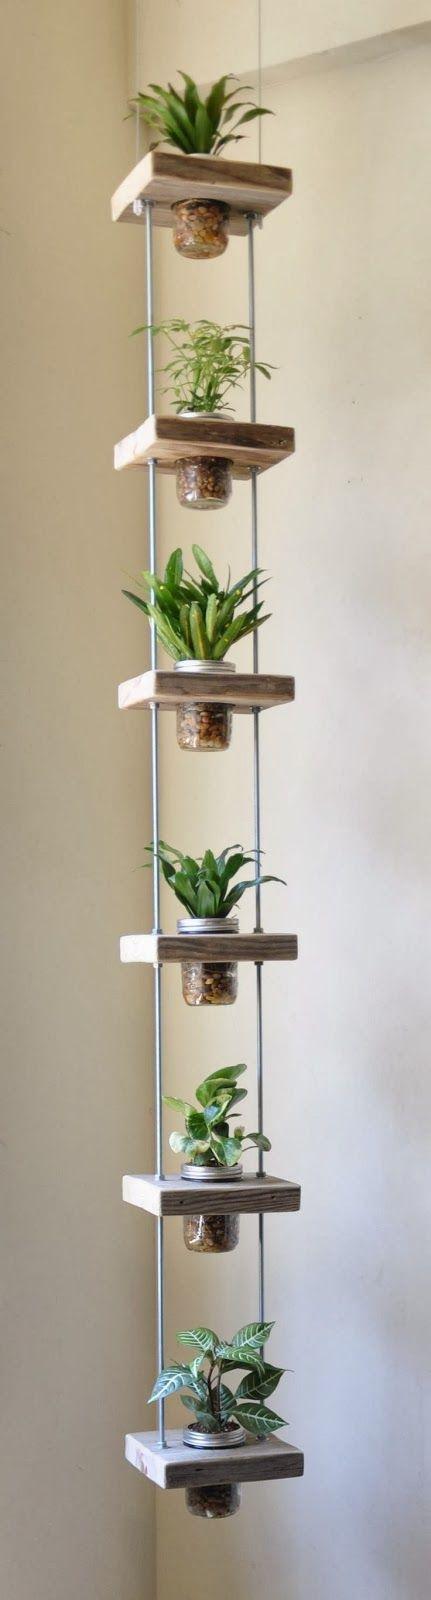 3 Hanging Platform Simphome com